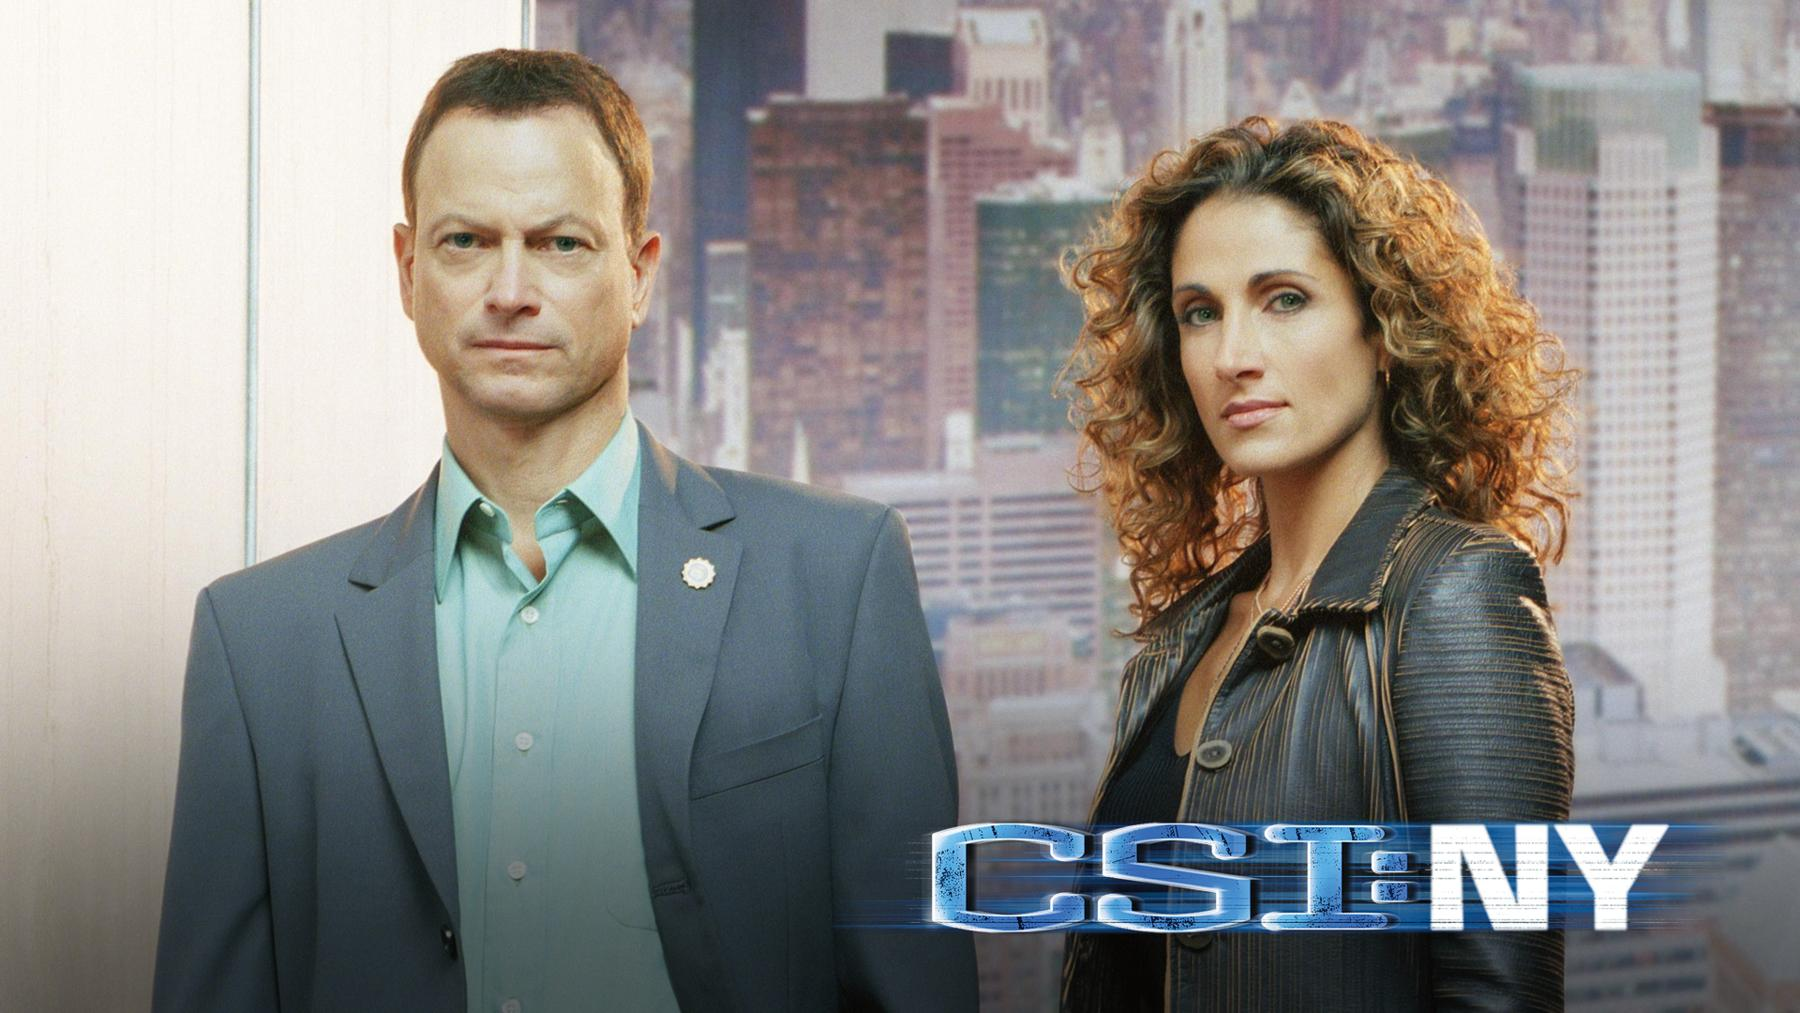 CSI: NY - VOX